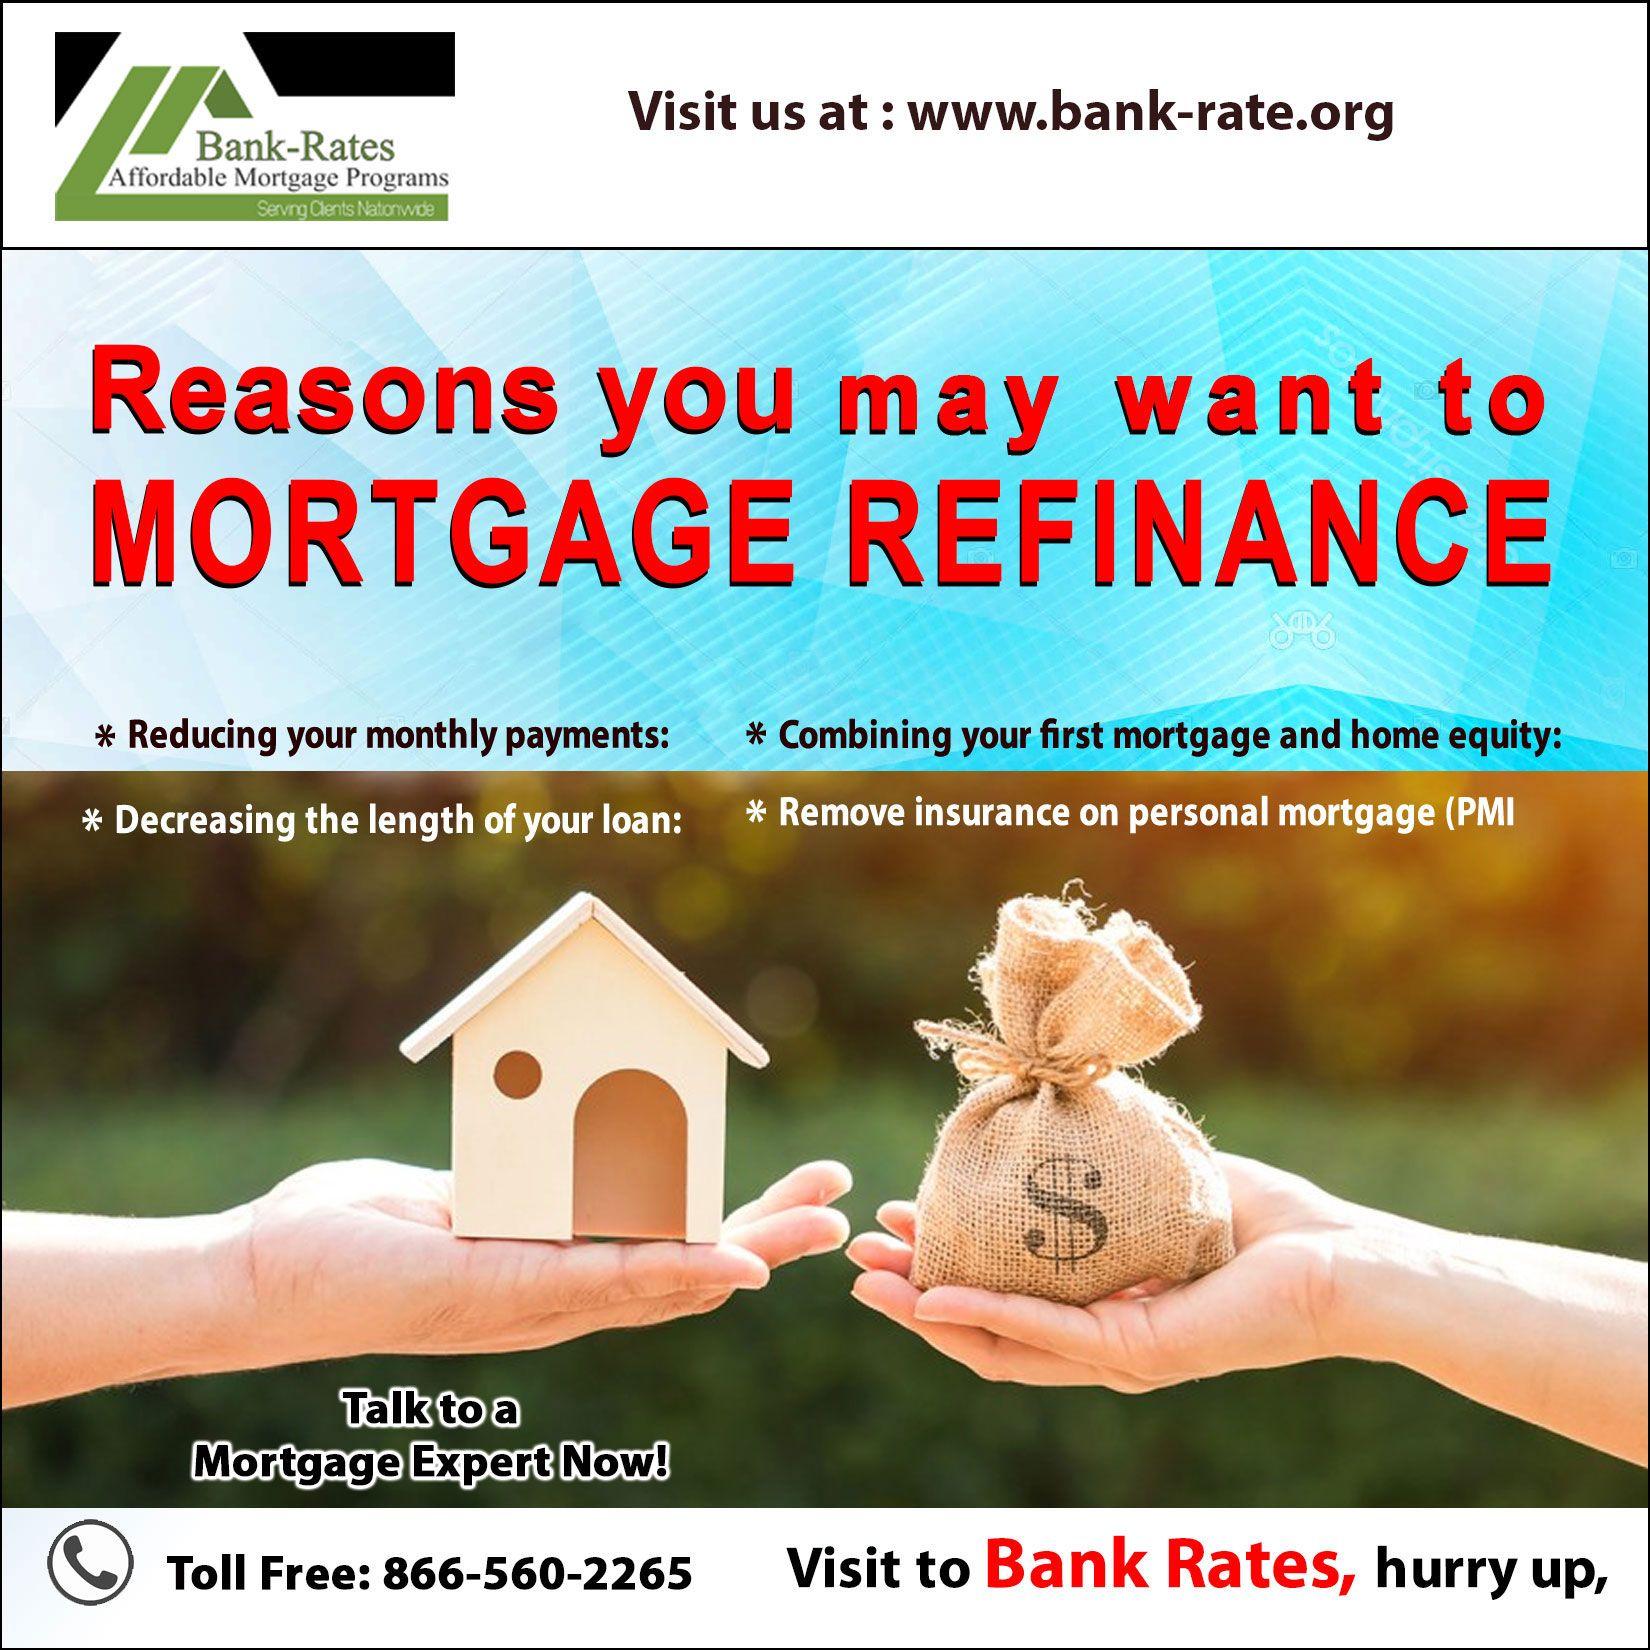 Bank rate refinance loans refinance mortgage bank rate